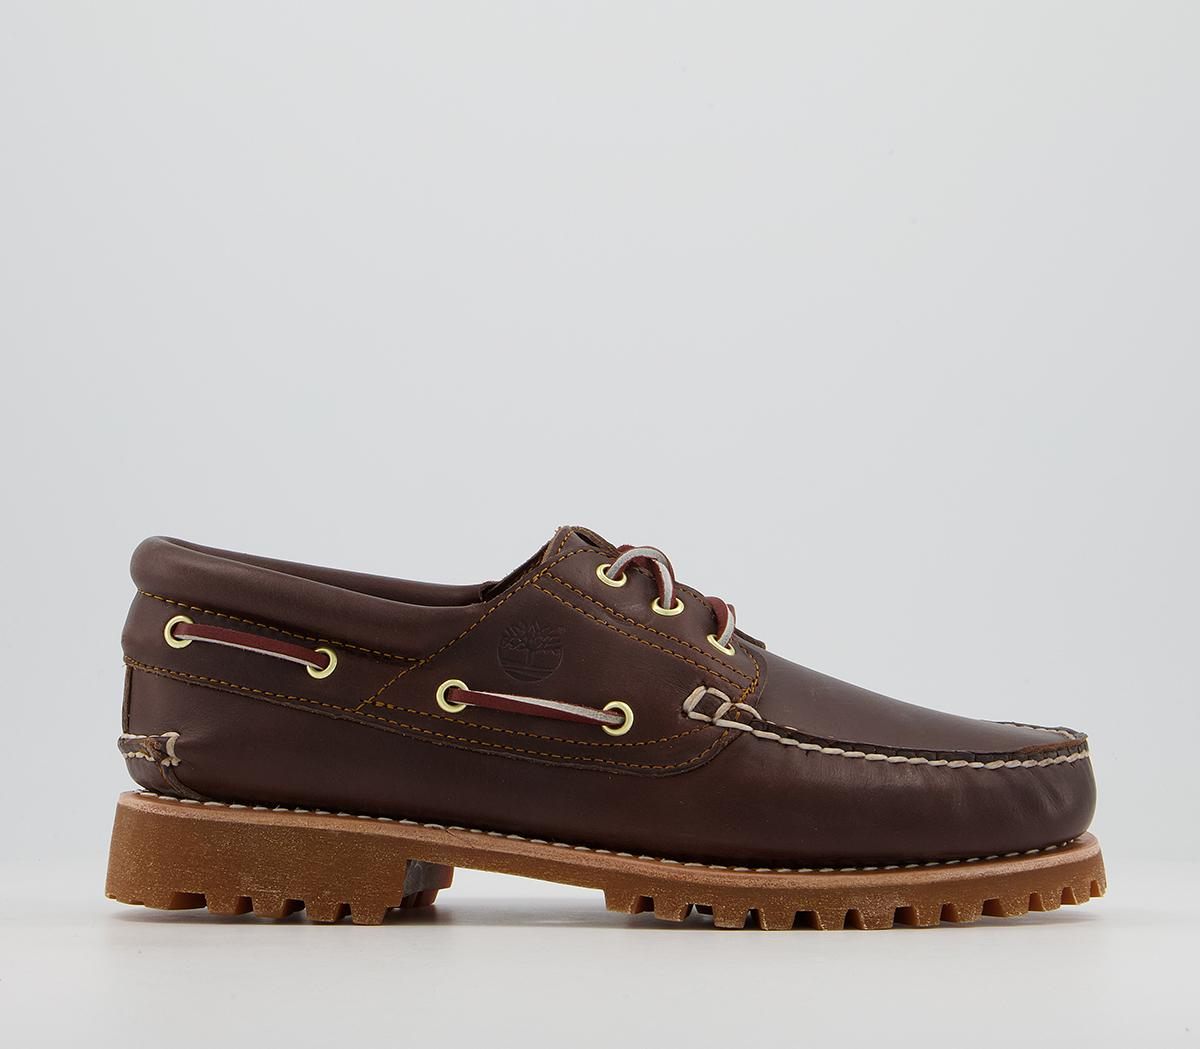 3 Eye Classic Lug Boat Shoes